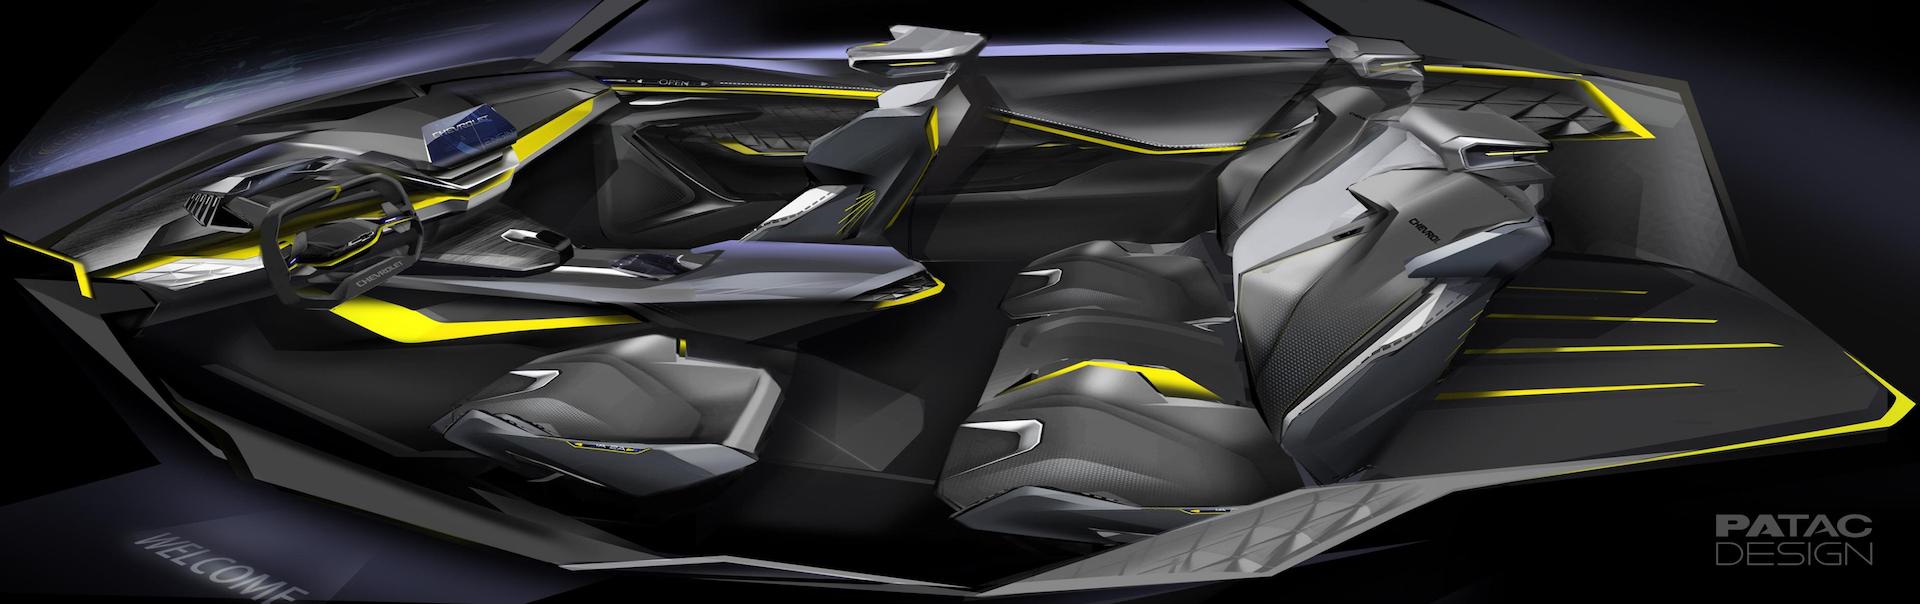 chevrolet-fnr-x-concept-2017-design-sketches-12